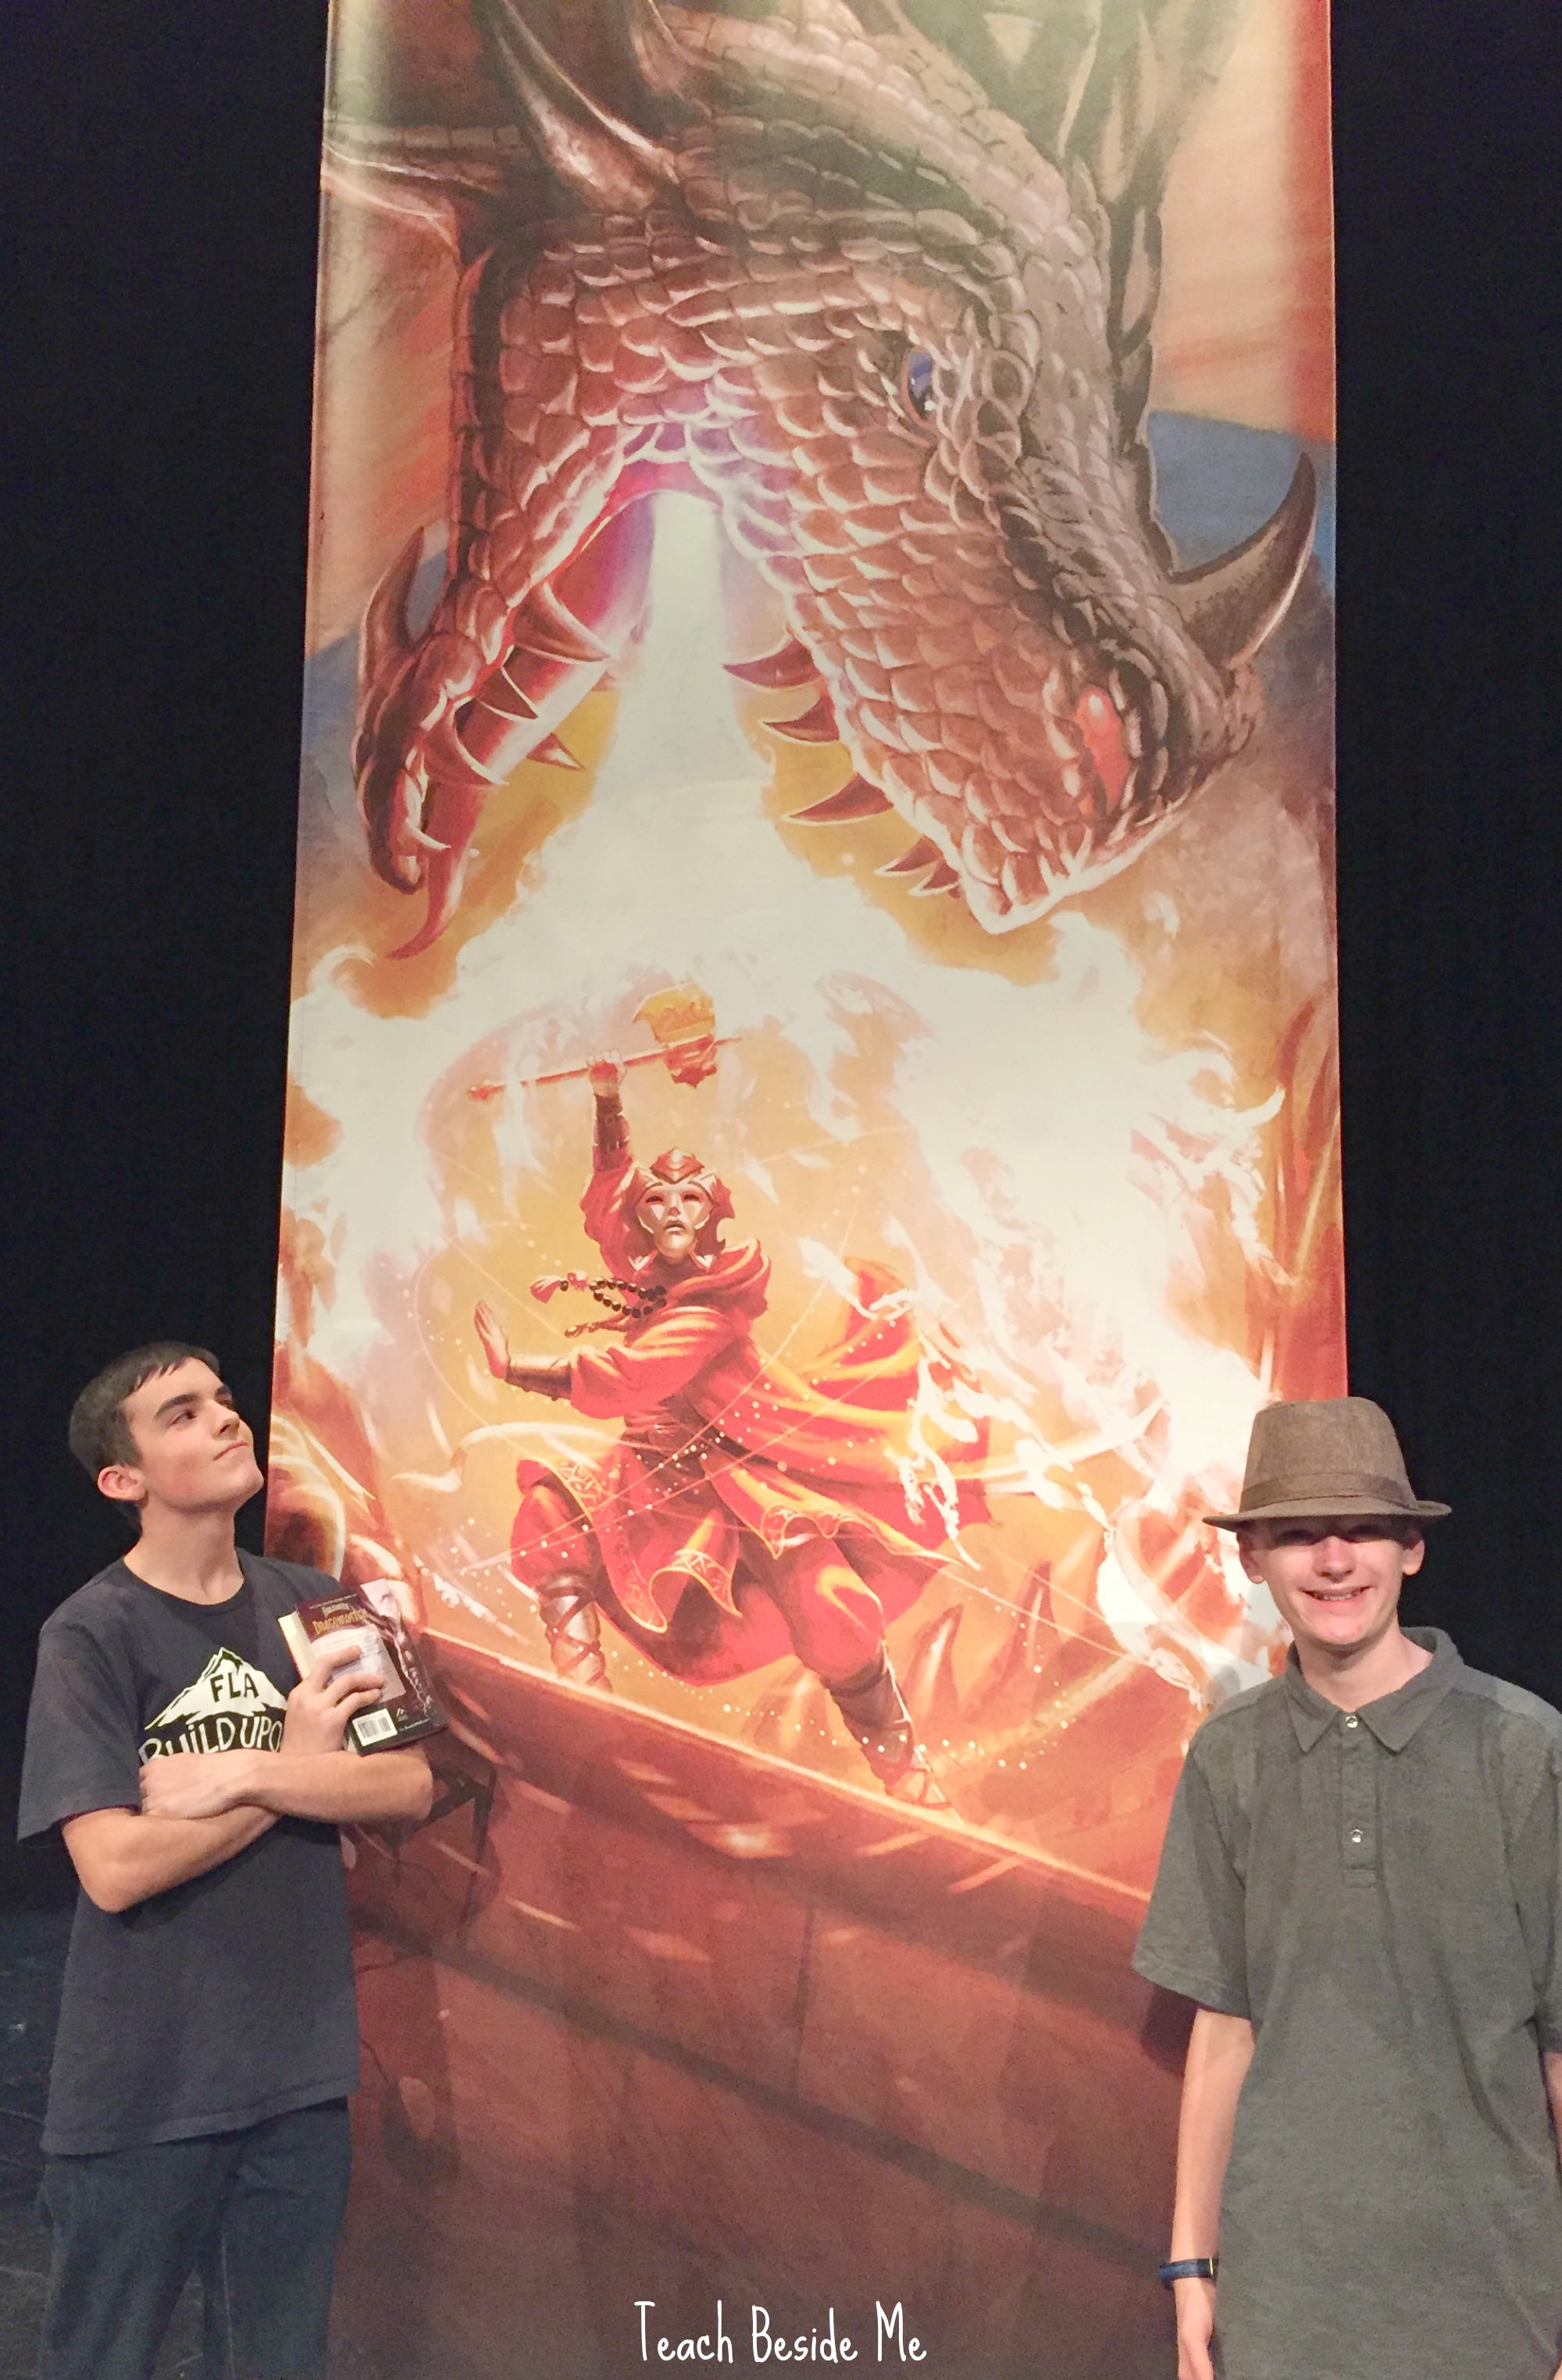 Brandon Mull's New Book: DragonWatch